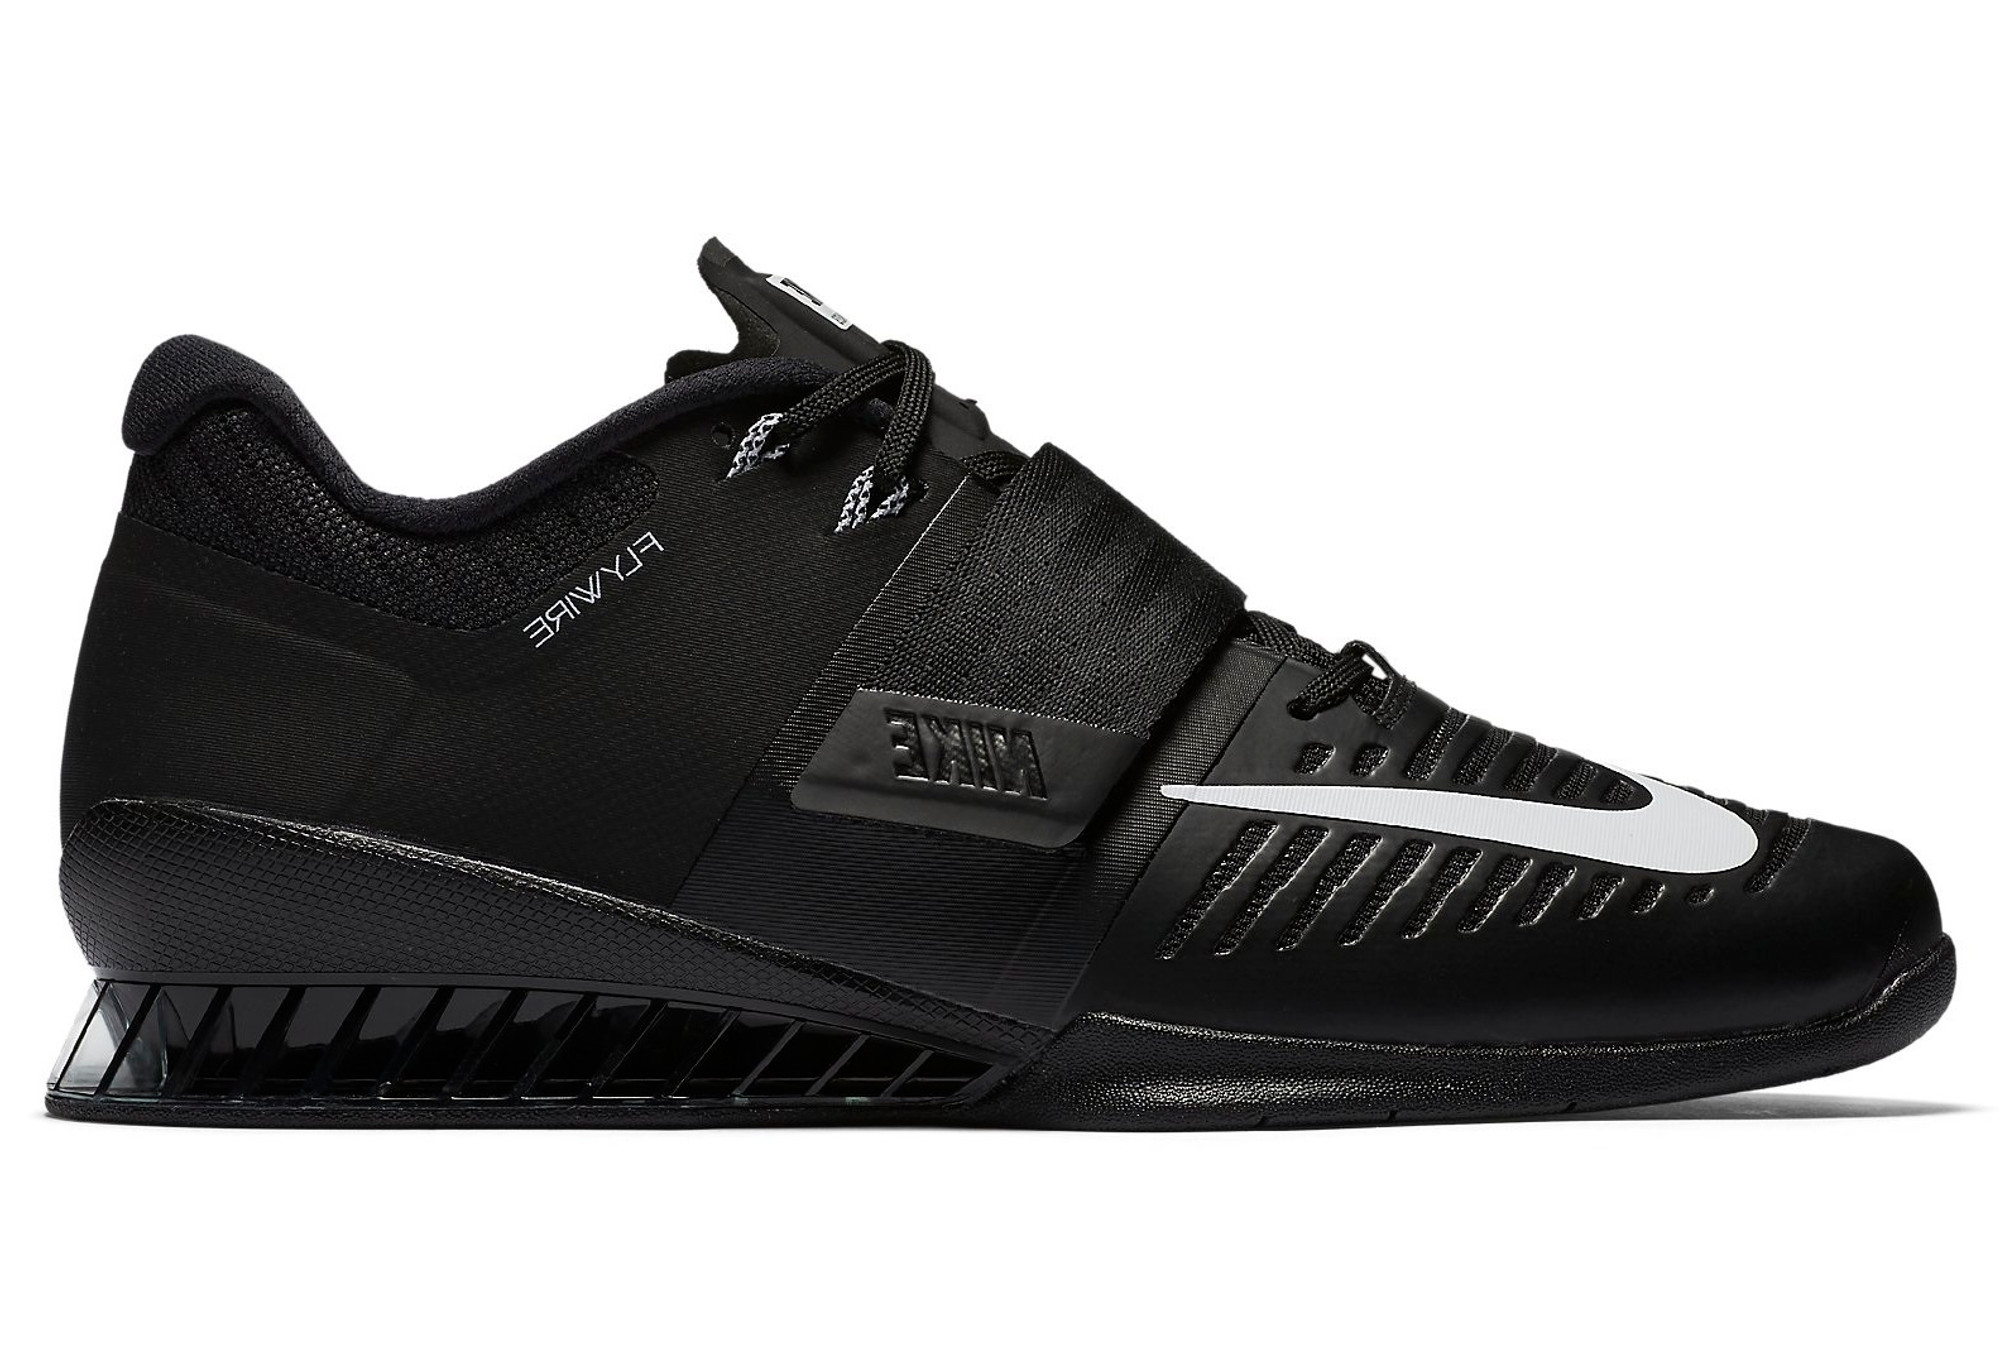 promo code 31ab8 f2e76 Chaussures de Cross Training Nike Romaleos 3 Noir